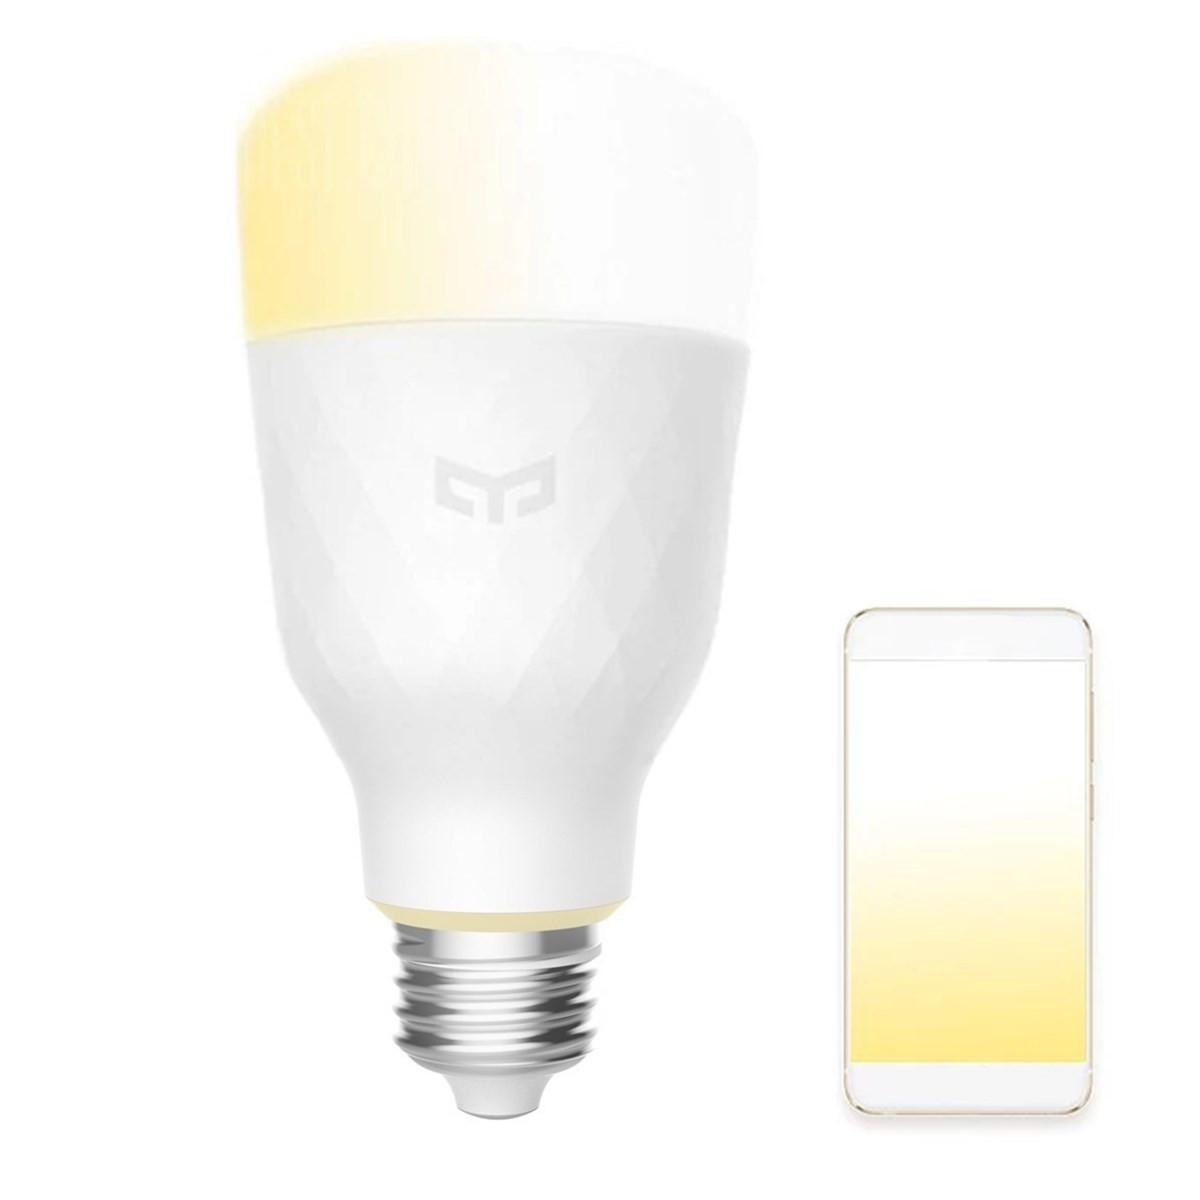 Xiaomi Yeelight YLDP05YL E27 10W Теплый белый для Daywhite Smart LED Bulb Wifi App Control AC100-240V 1TopShop